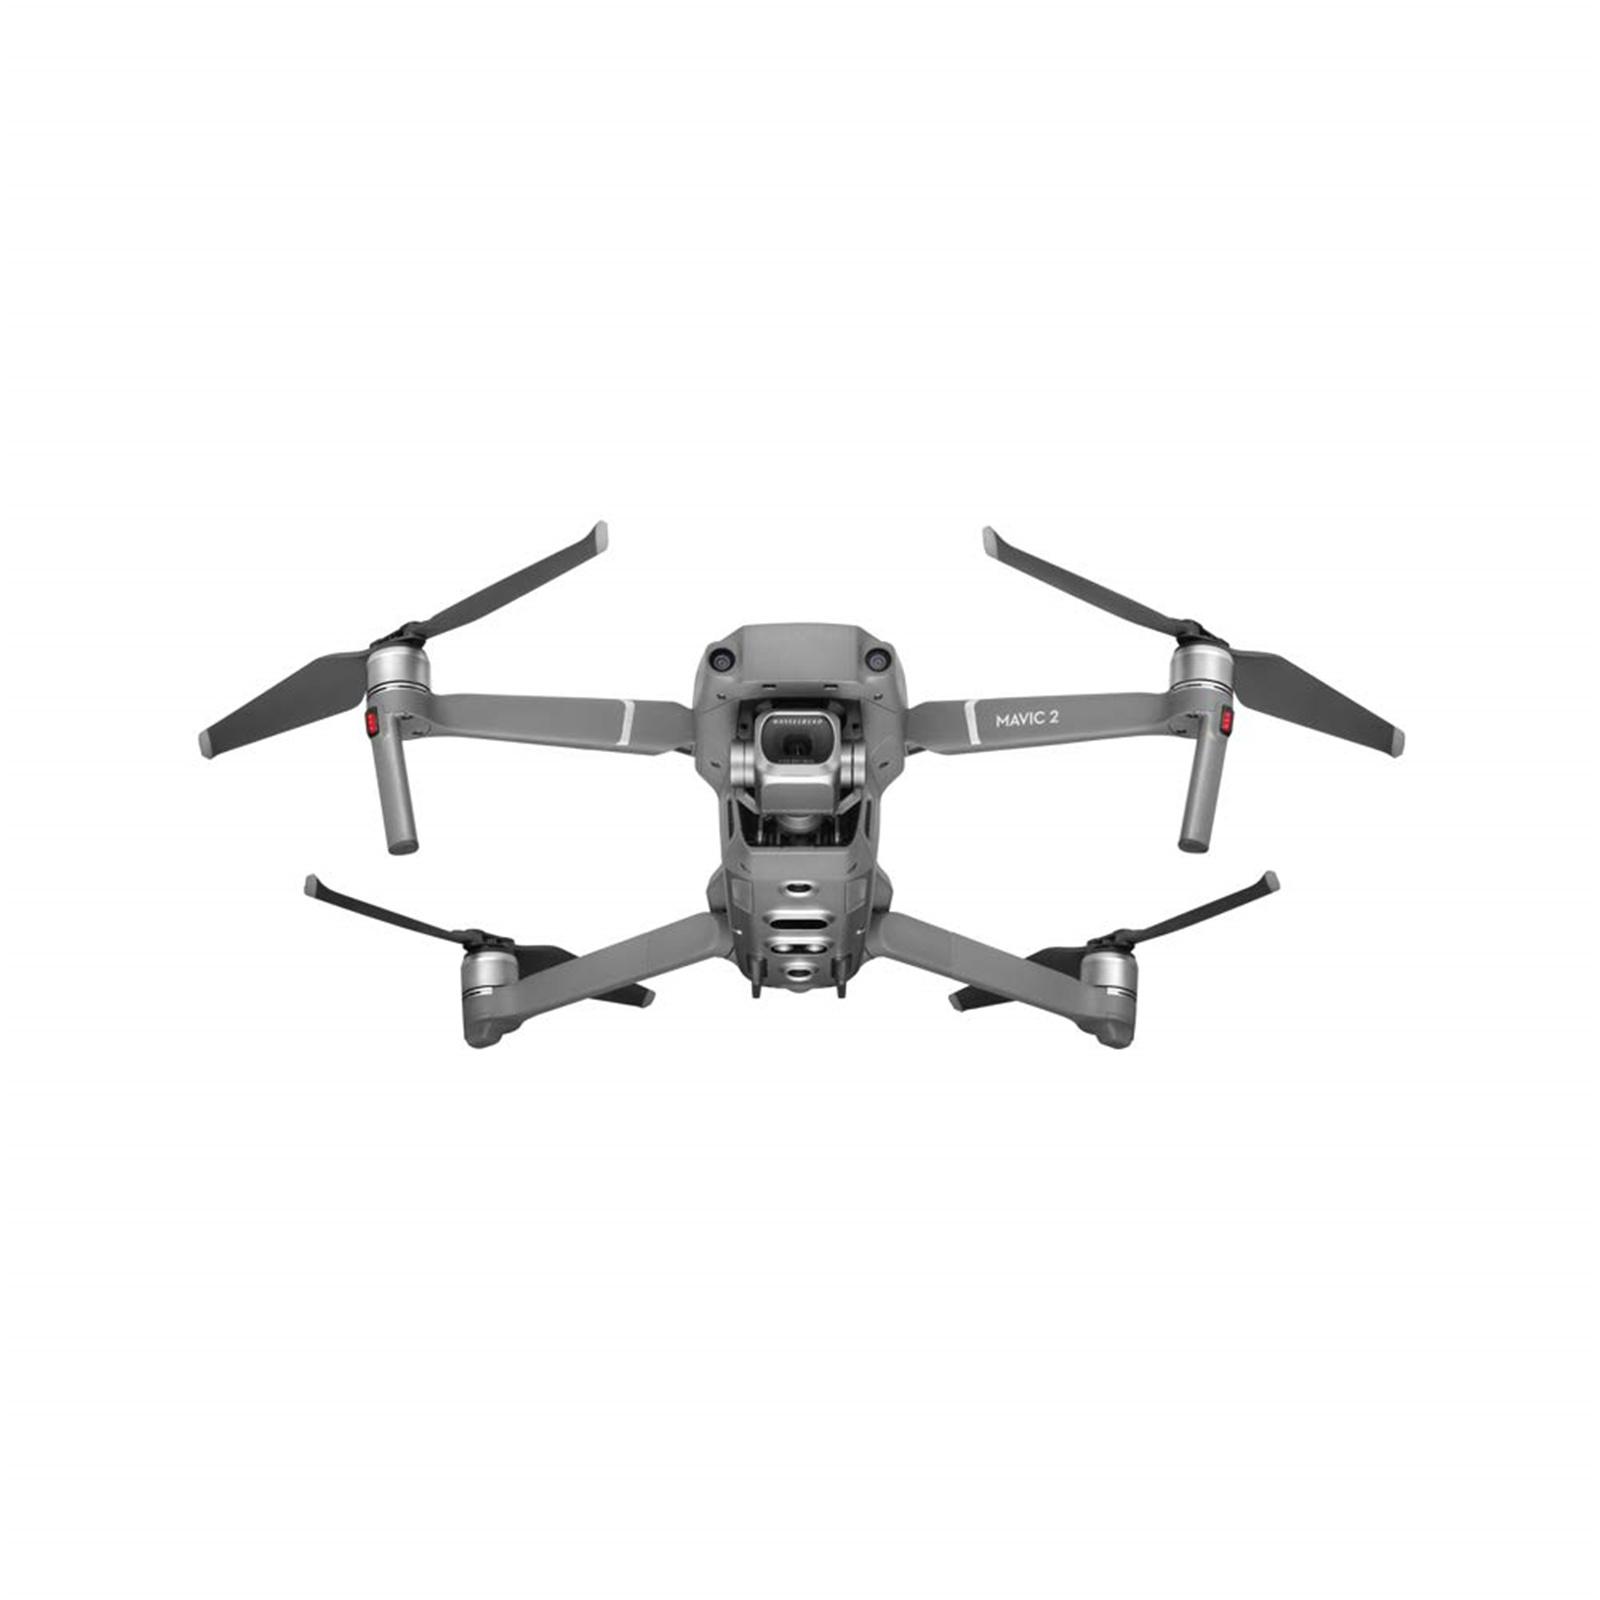 Buy the DJI Mavic 2 Pro Drone with Hasselblad Camera (Smart